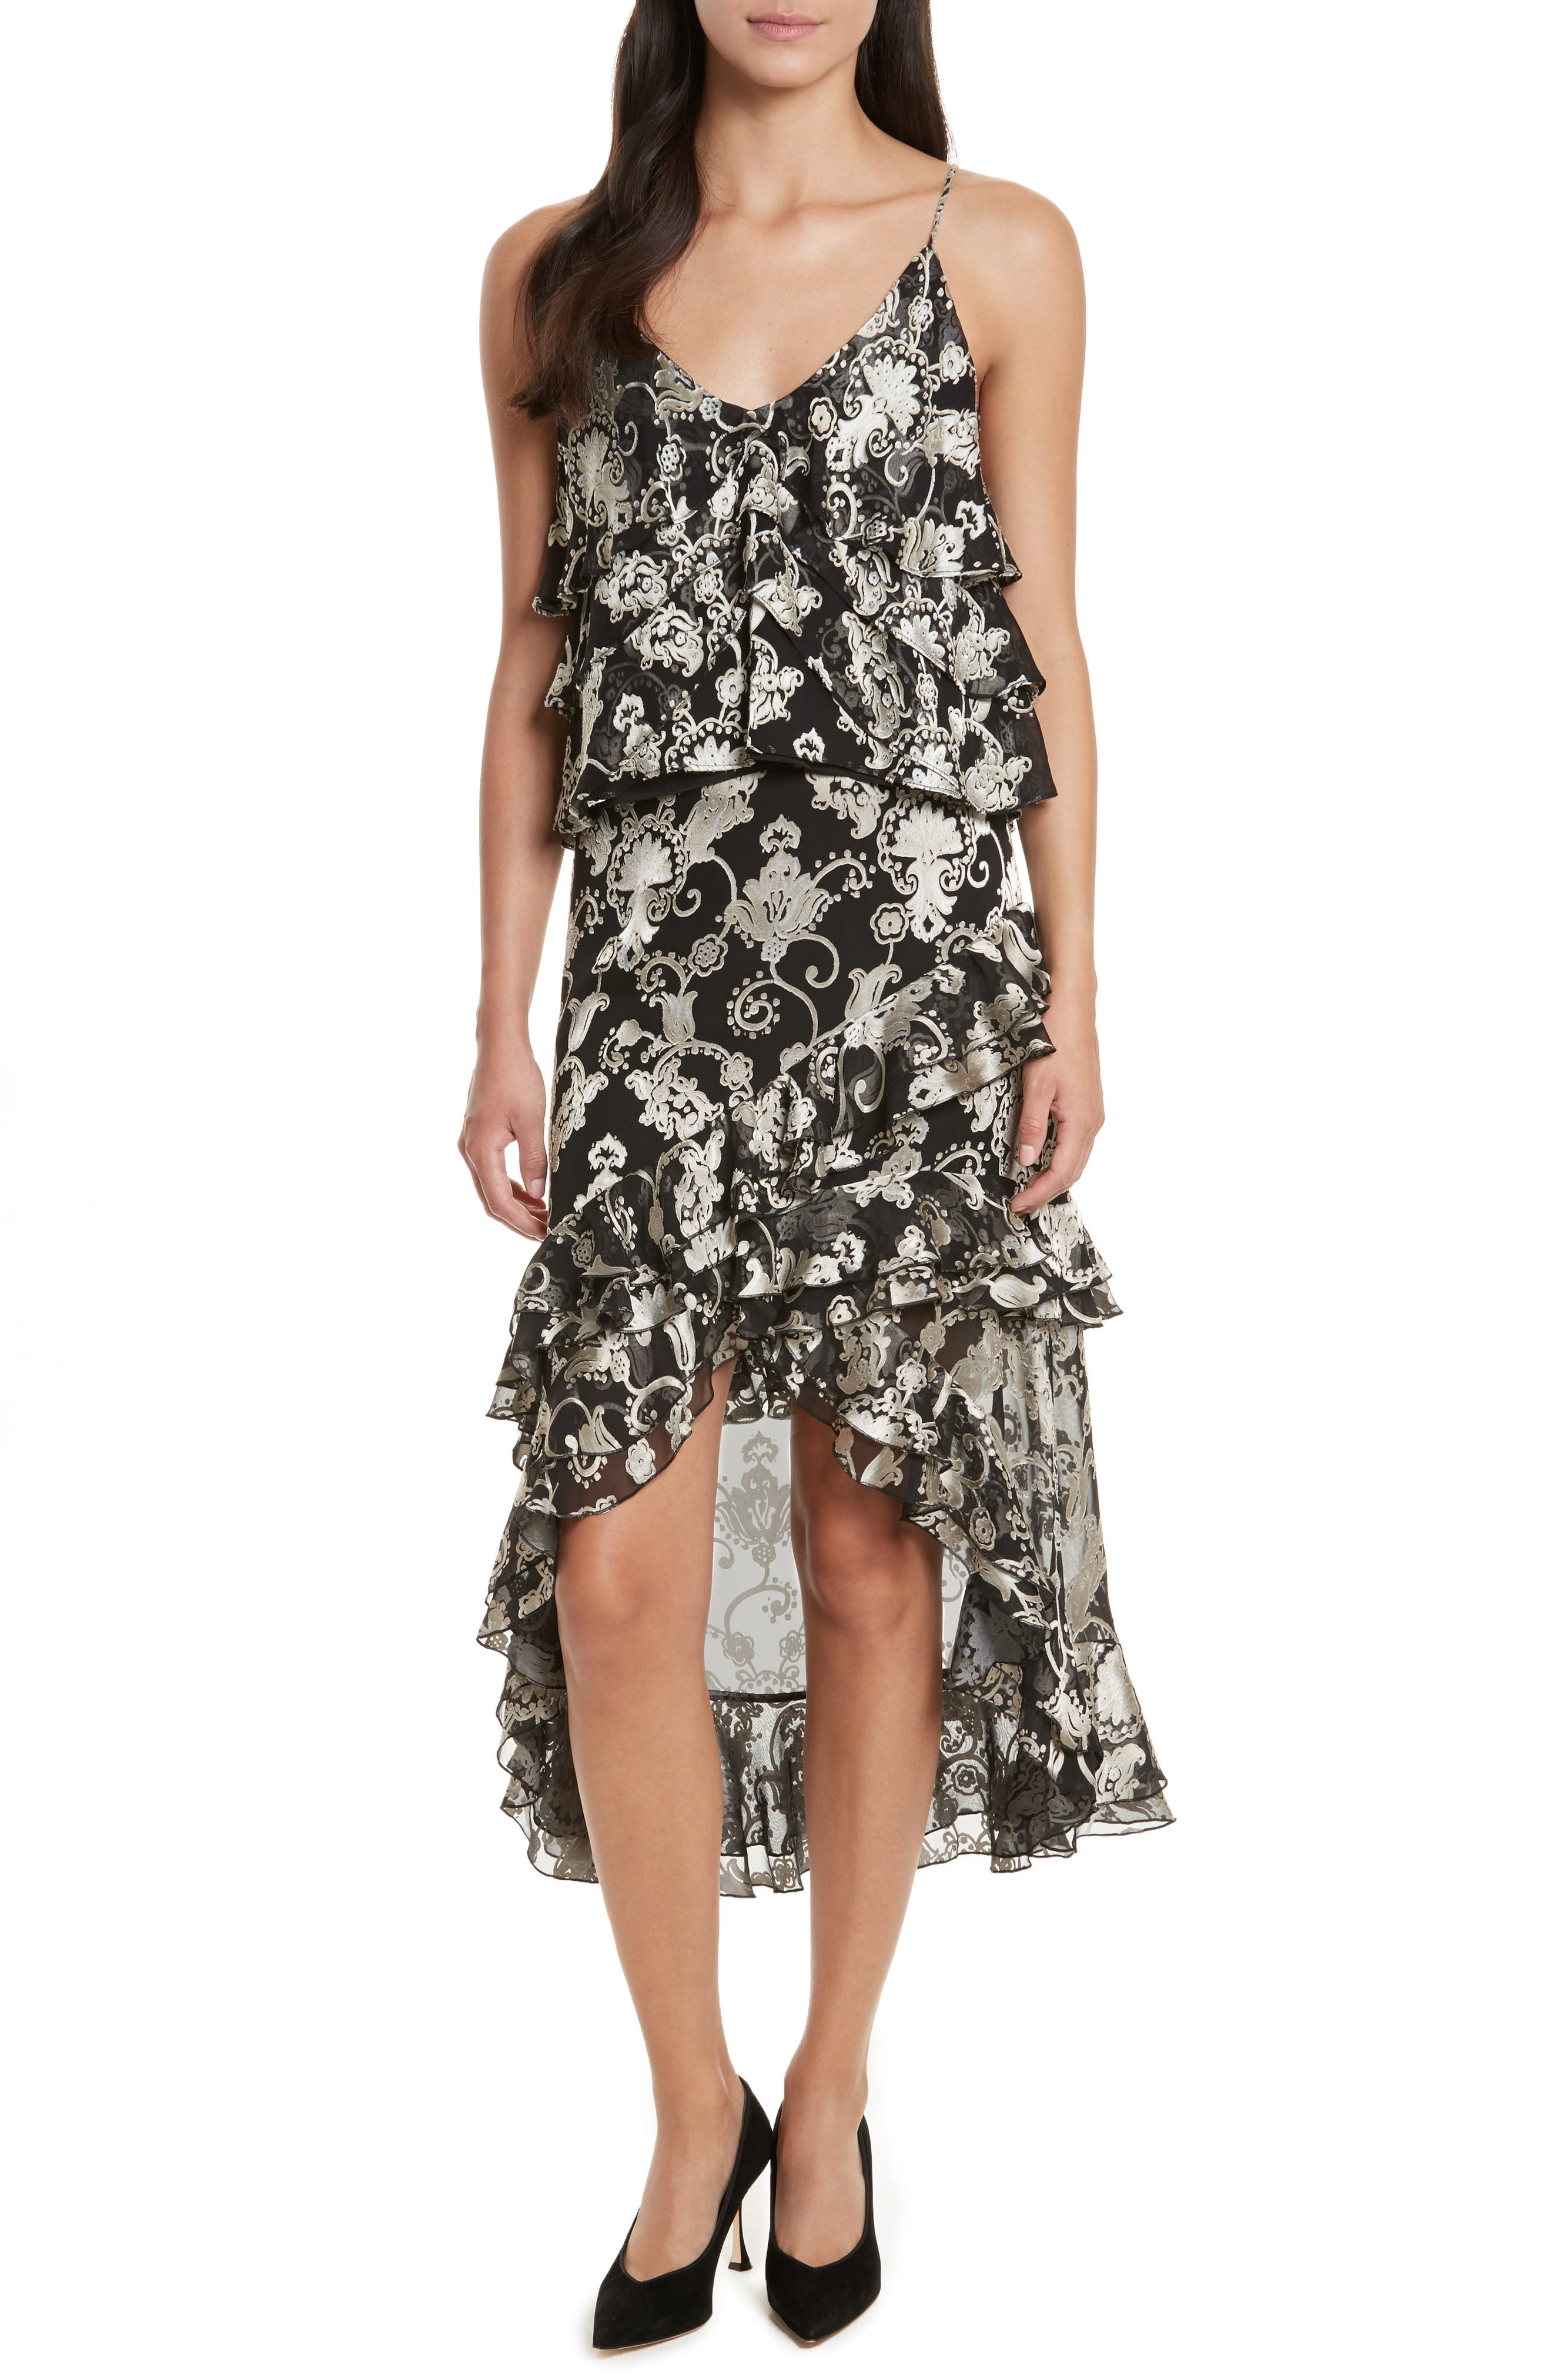 Sasha Asymmetrical Tiered Ruffle Skirt,                             Alternate thumbnail 2, color,                             Black/ White